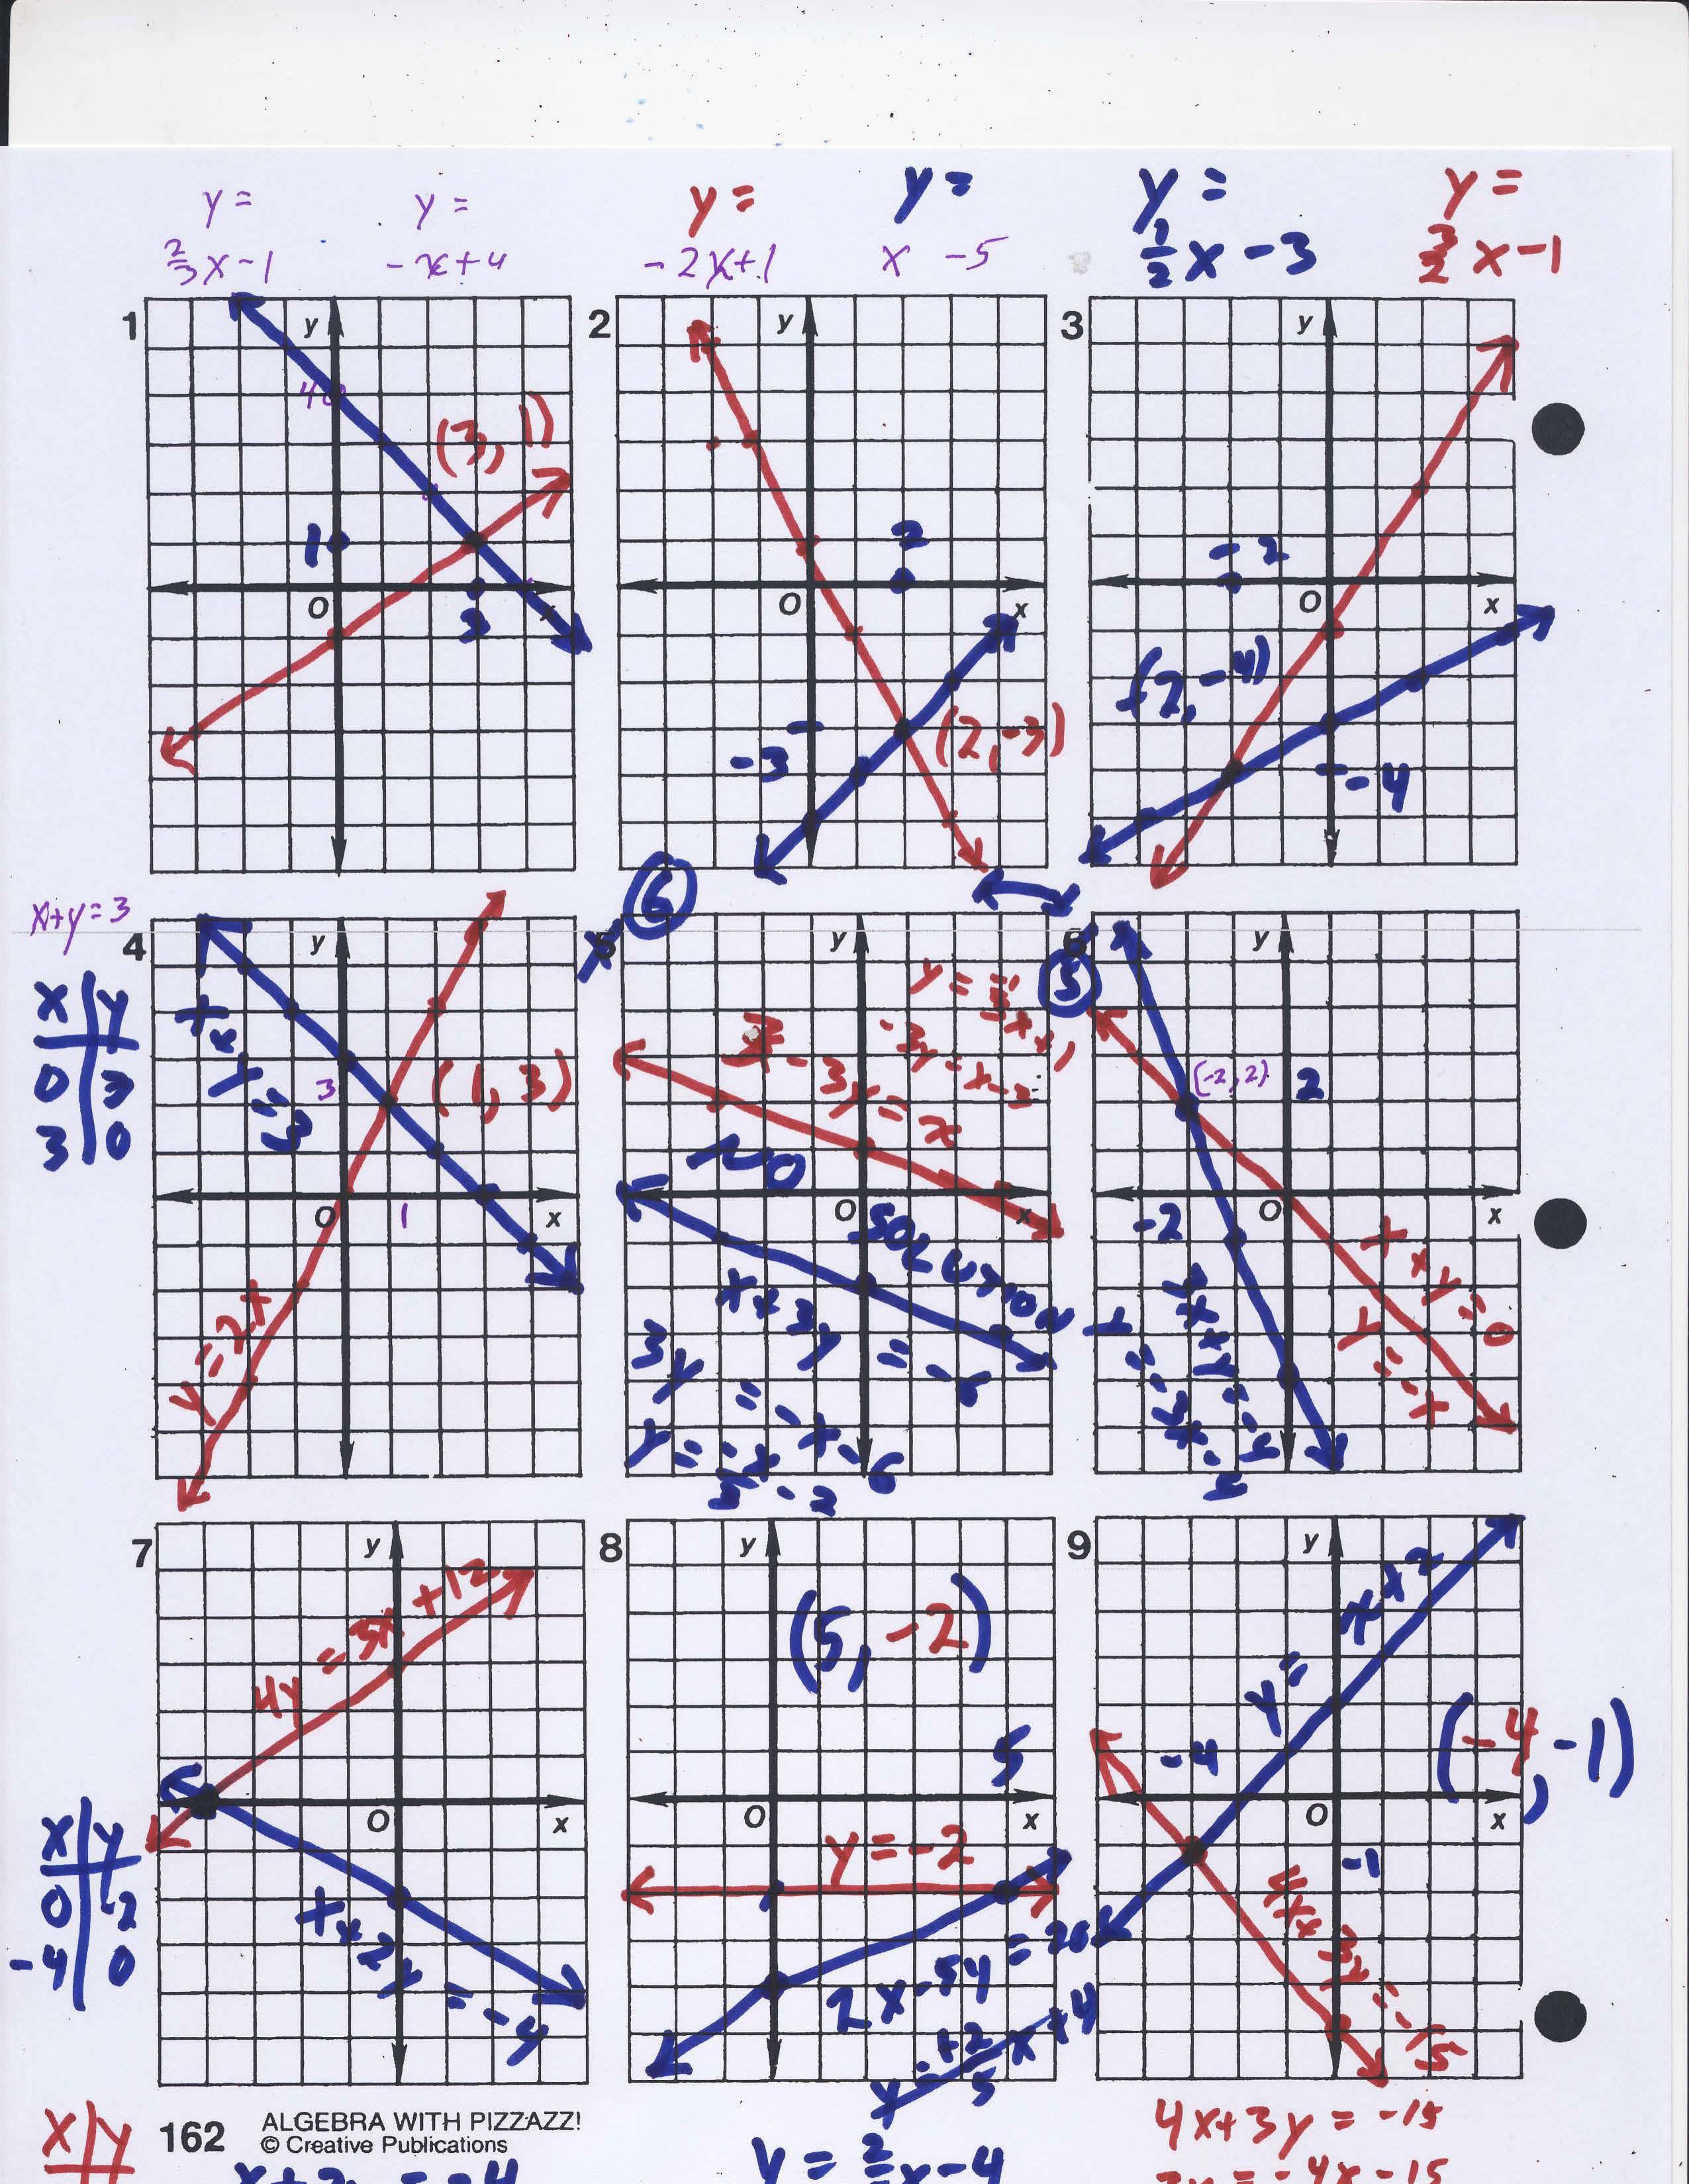 Gebhard Curt Algebra worksheets – Algebra with Pizzazz Worksheet Answers